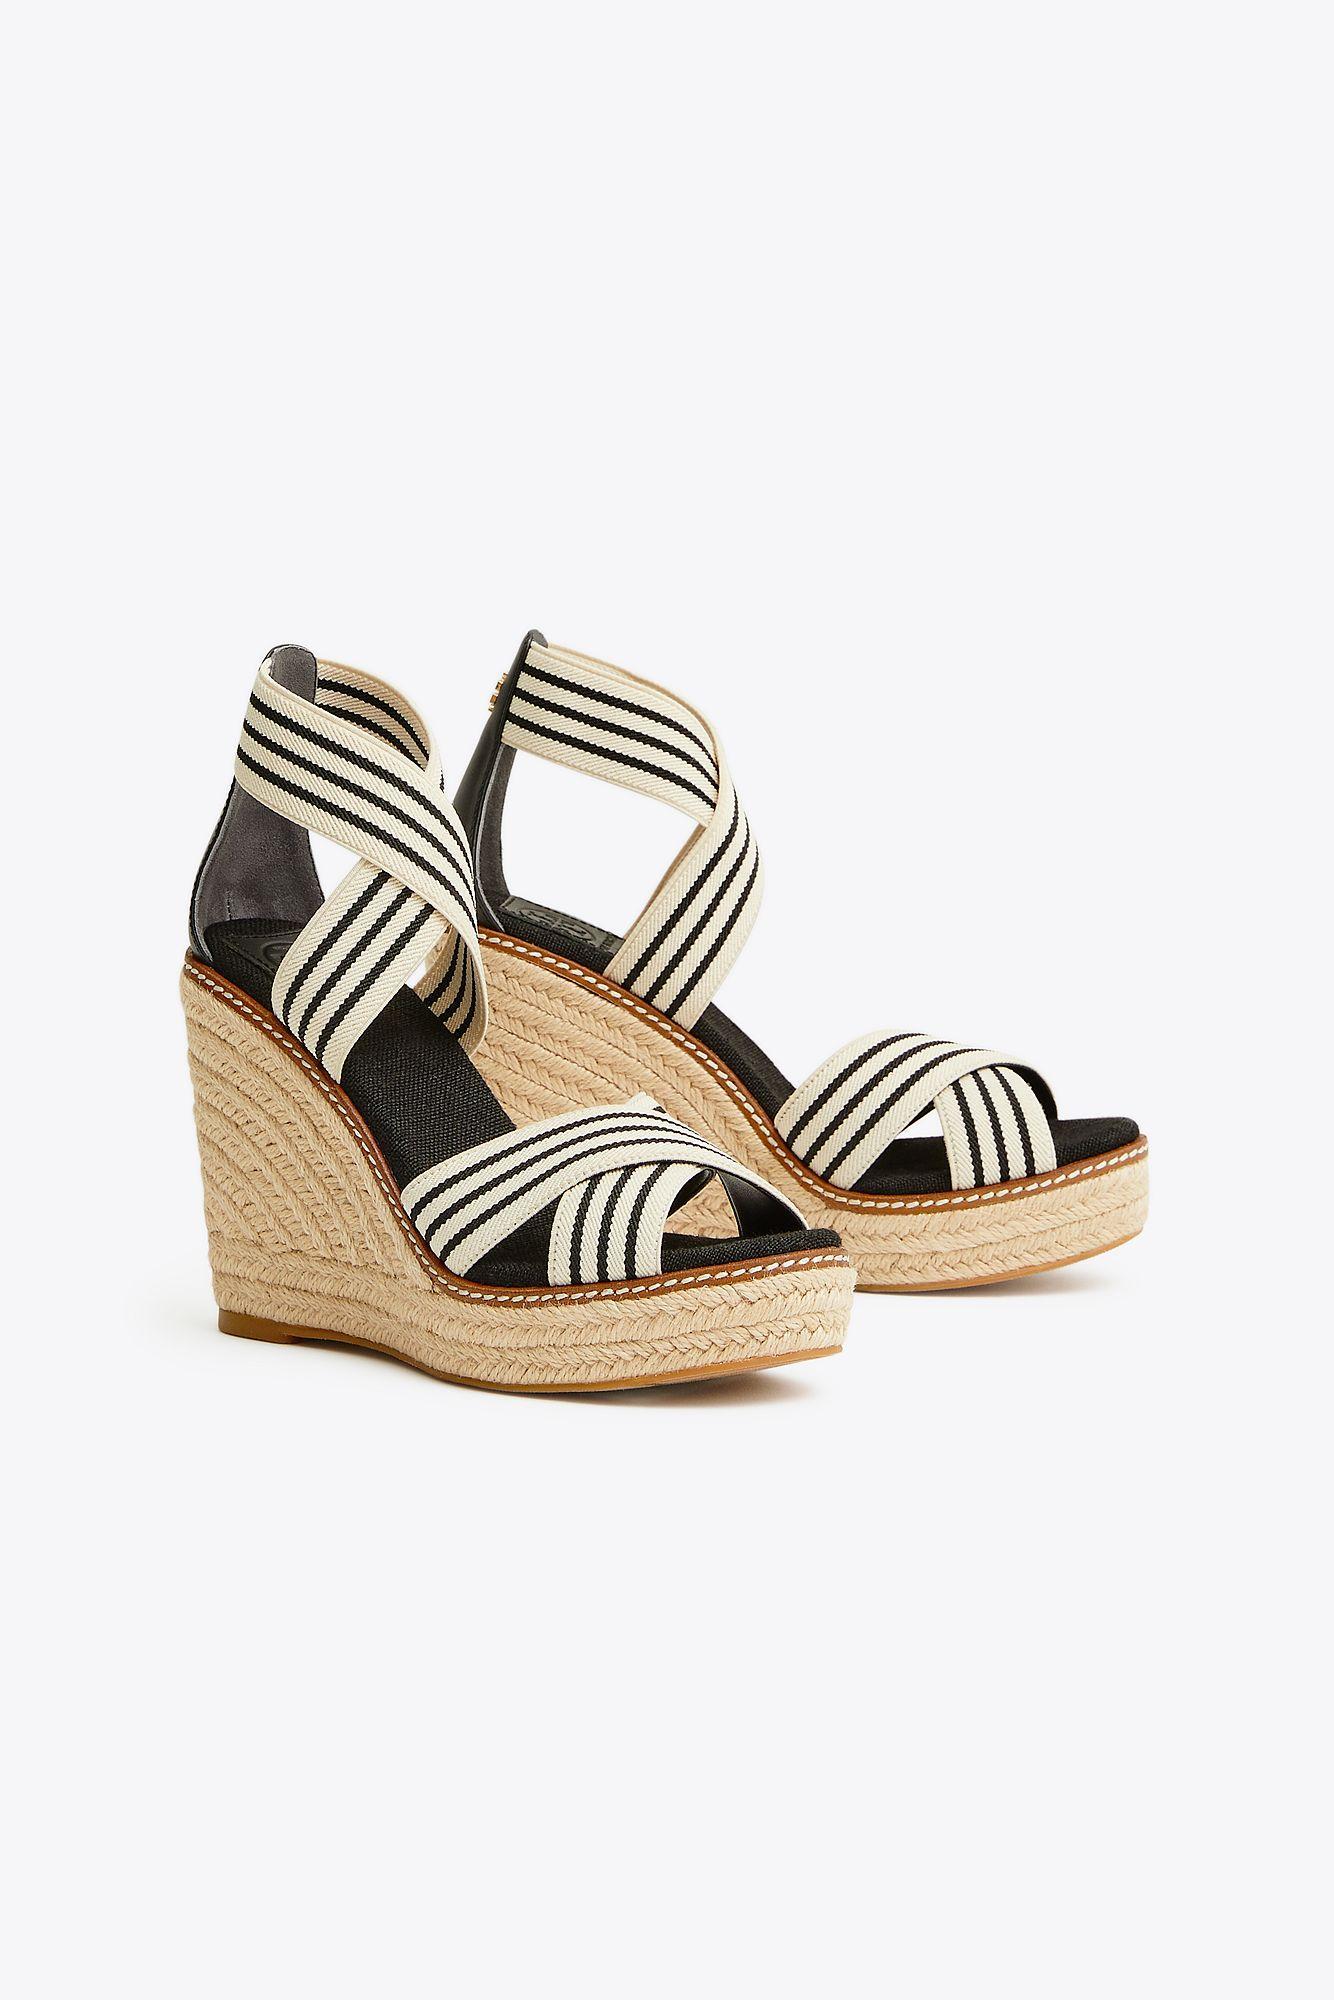 f3303a15b8b Lyst - Tory Burch Women's Frieda Platform Wedge Espadrille Sandals